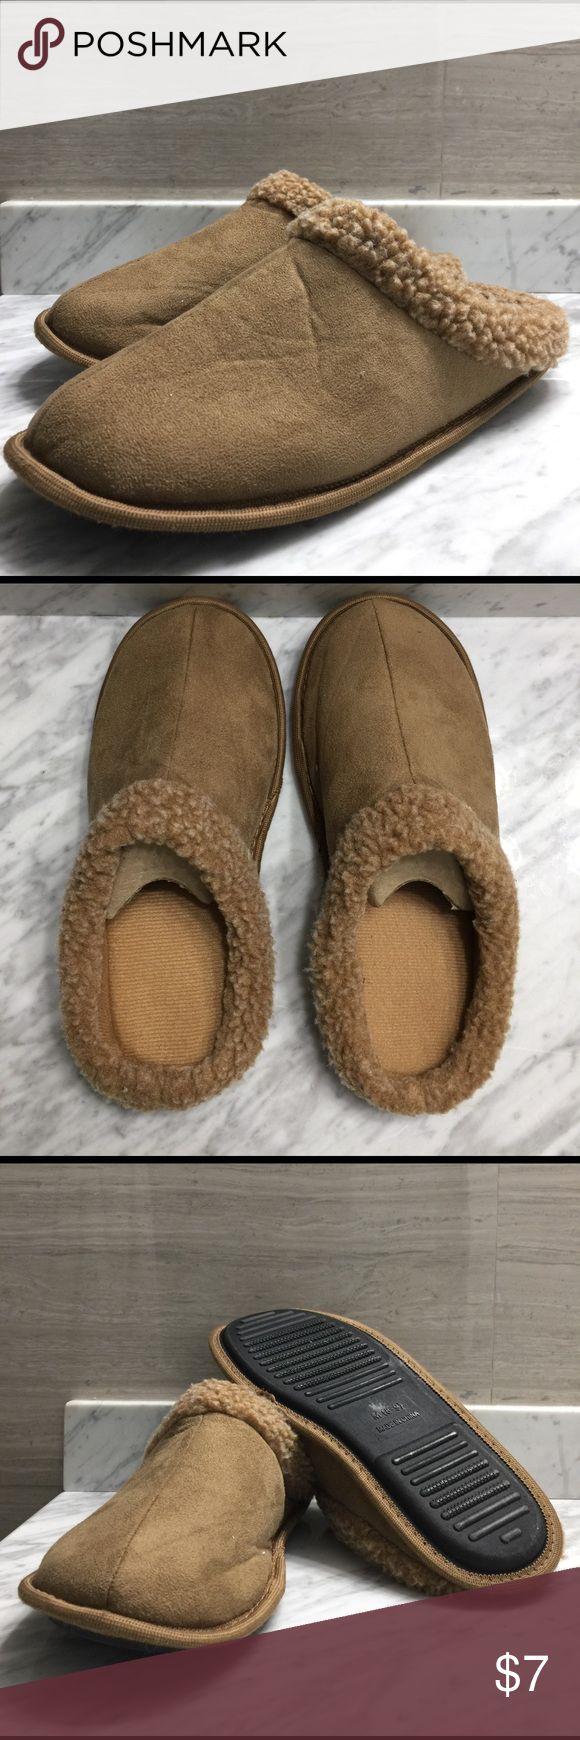 Men's Slippers Tan Men's bedroom slippers size 8-9. Worn a few times. Shoes Sandals & Flip-Flops